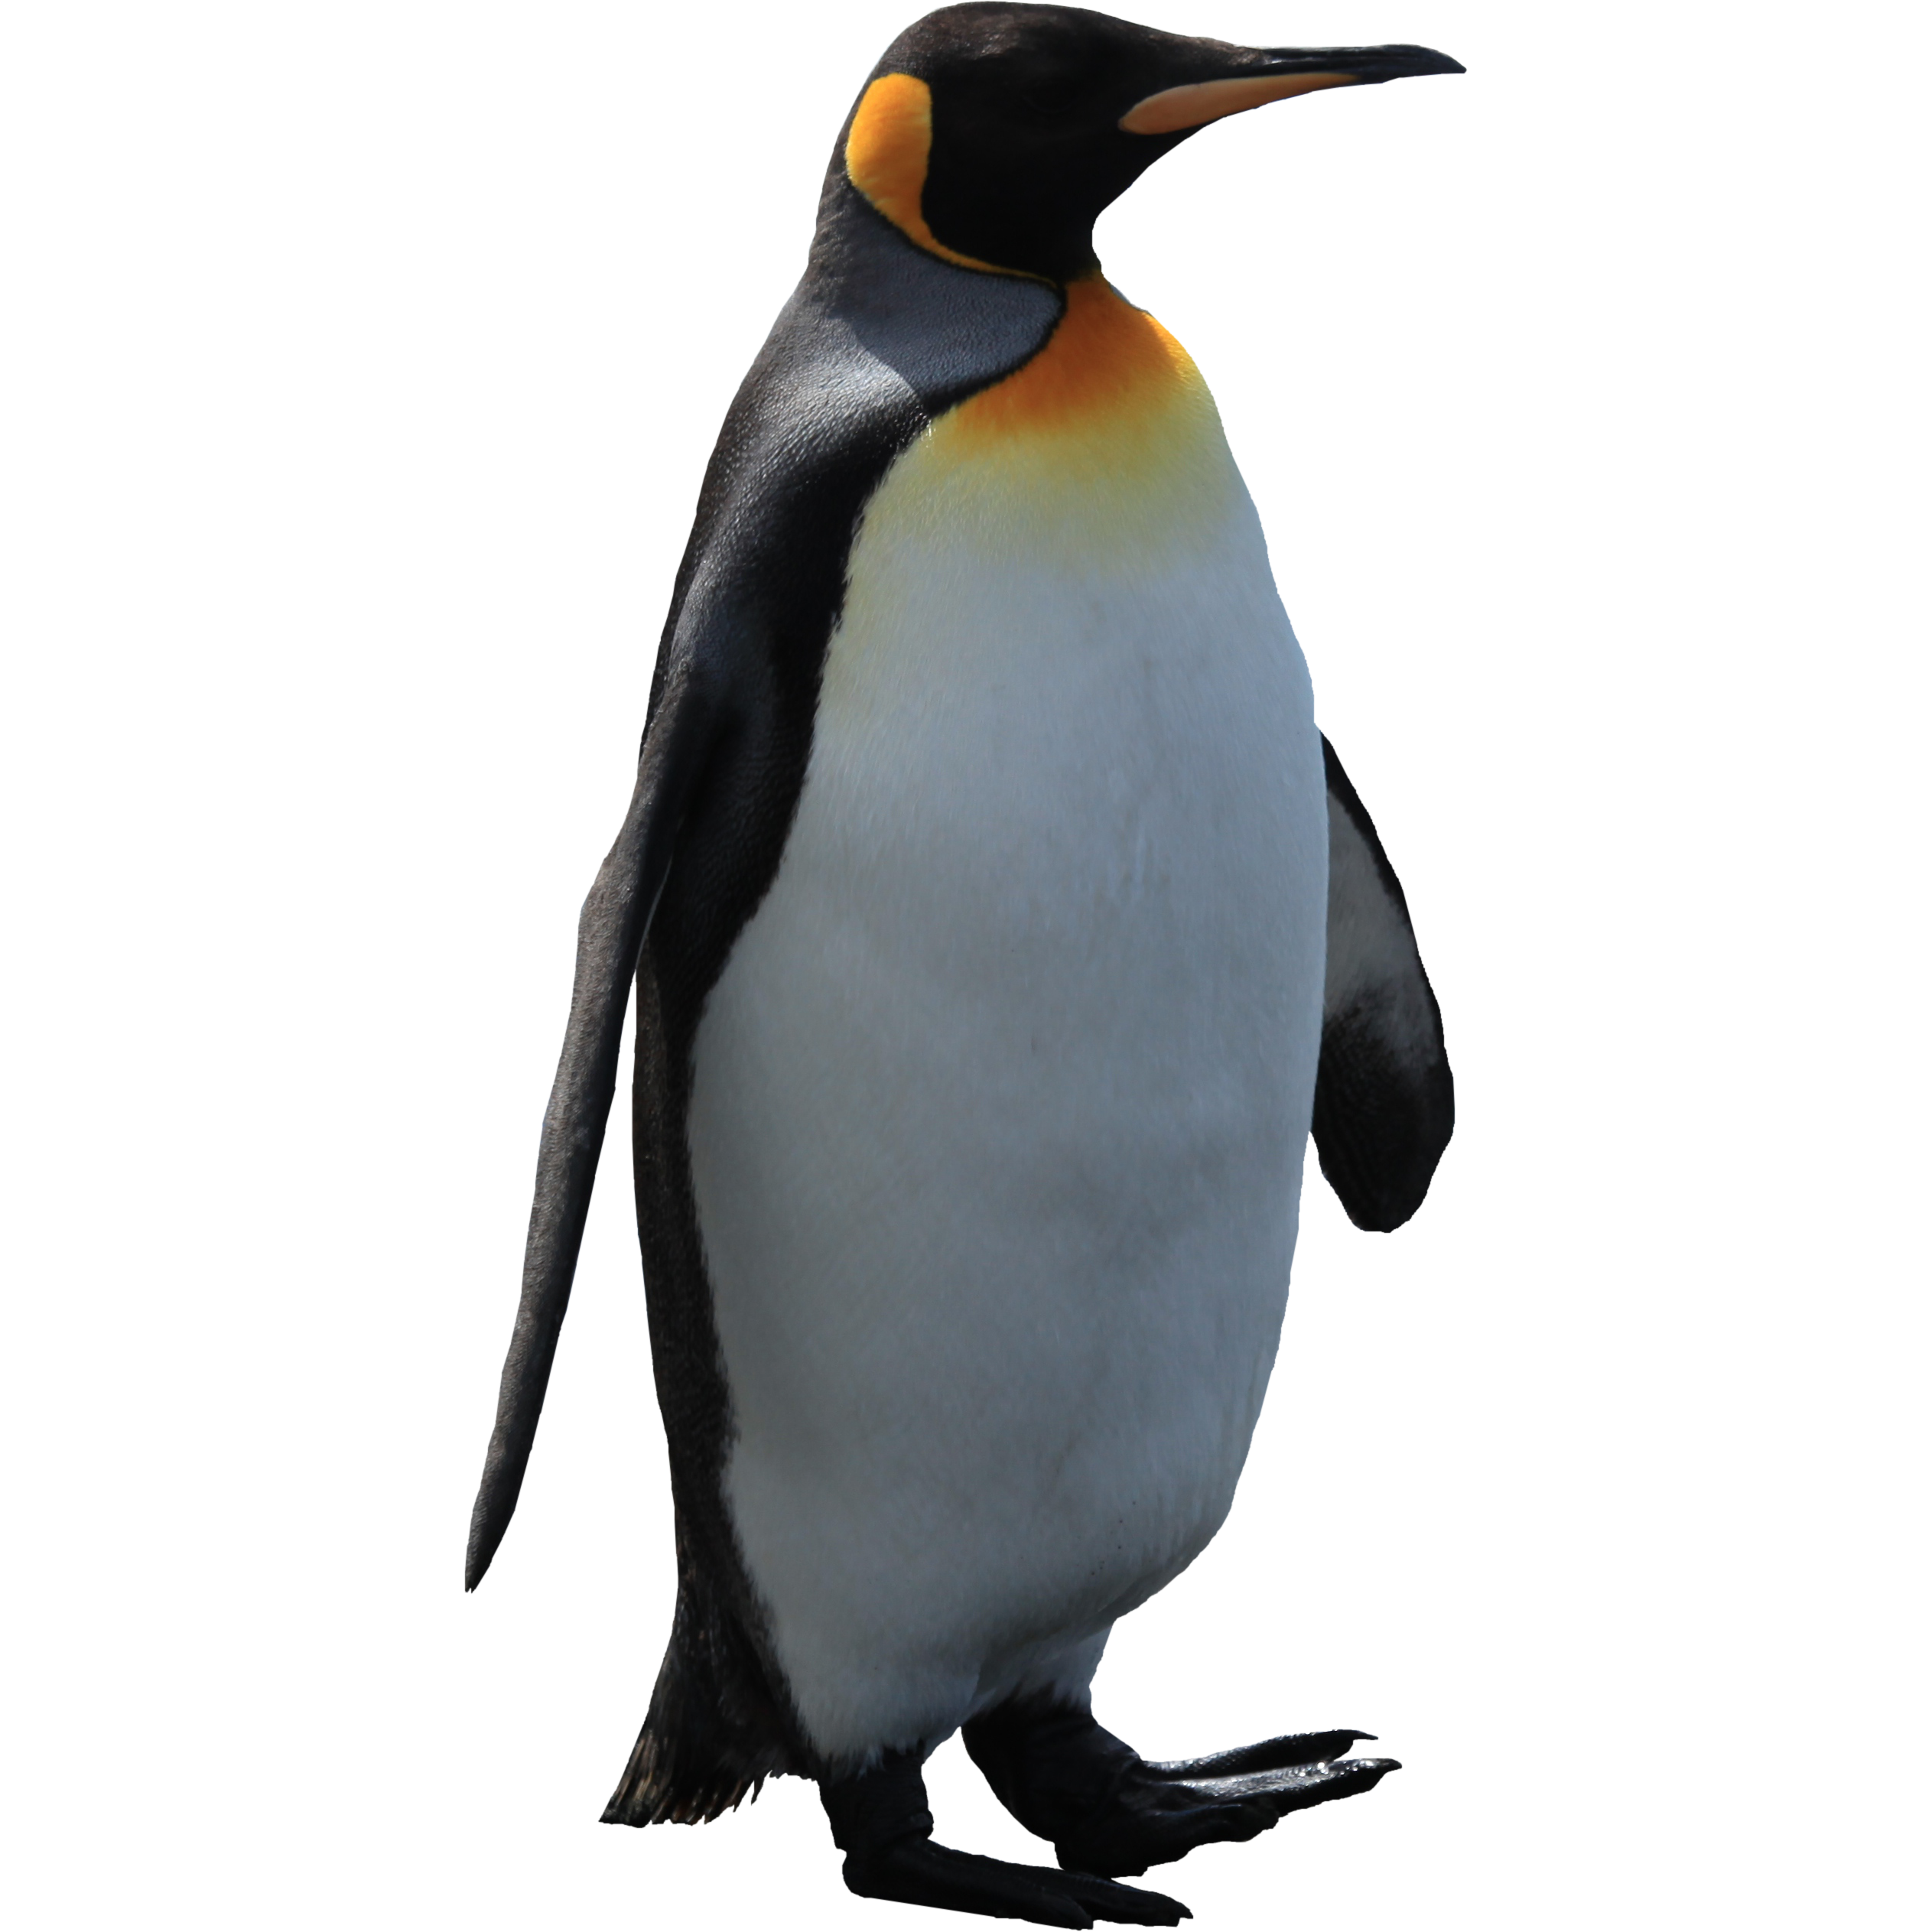 Imperator Penguin Png Image - Penguin, Transparent background PNG HD thumbnail